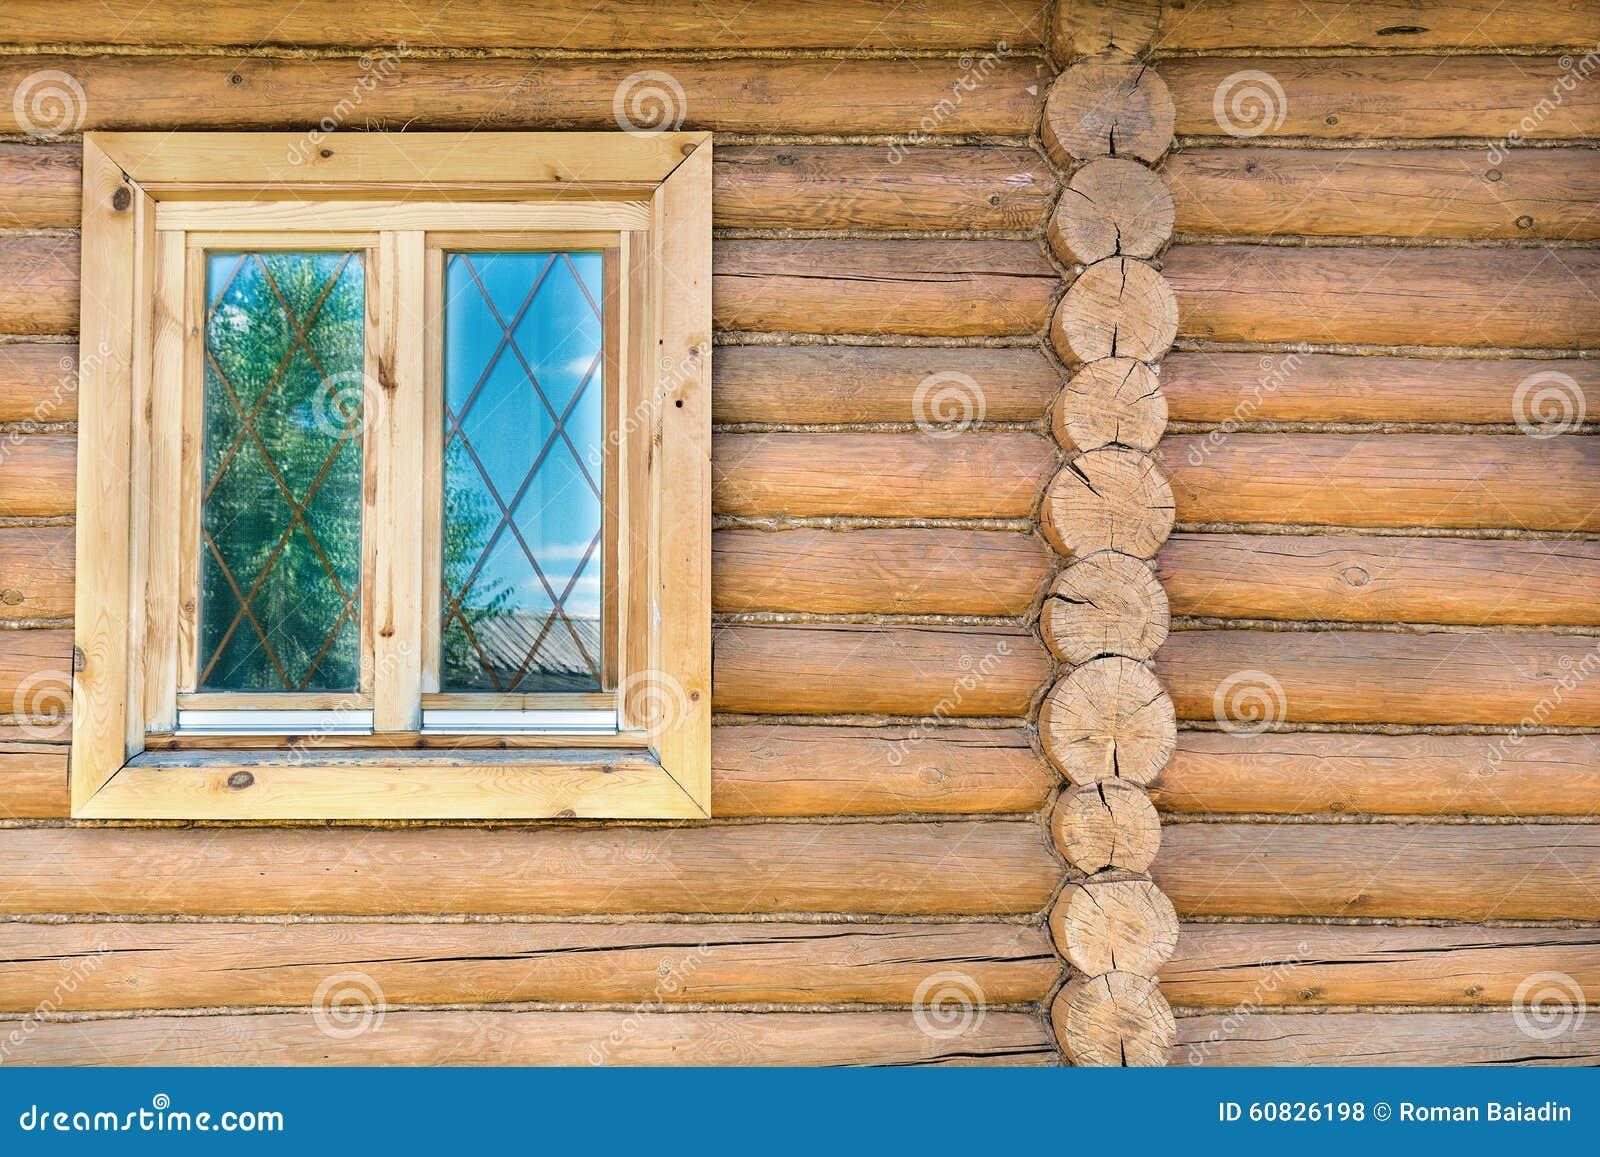 Pared del registro con una ventana